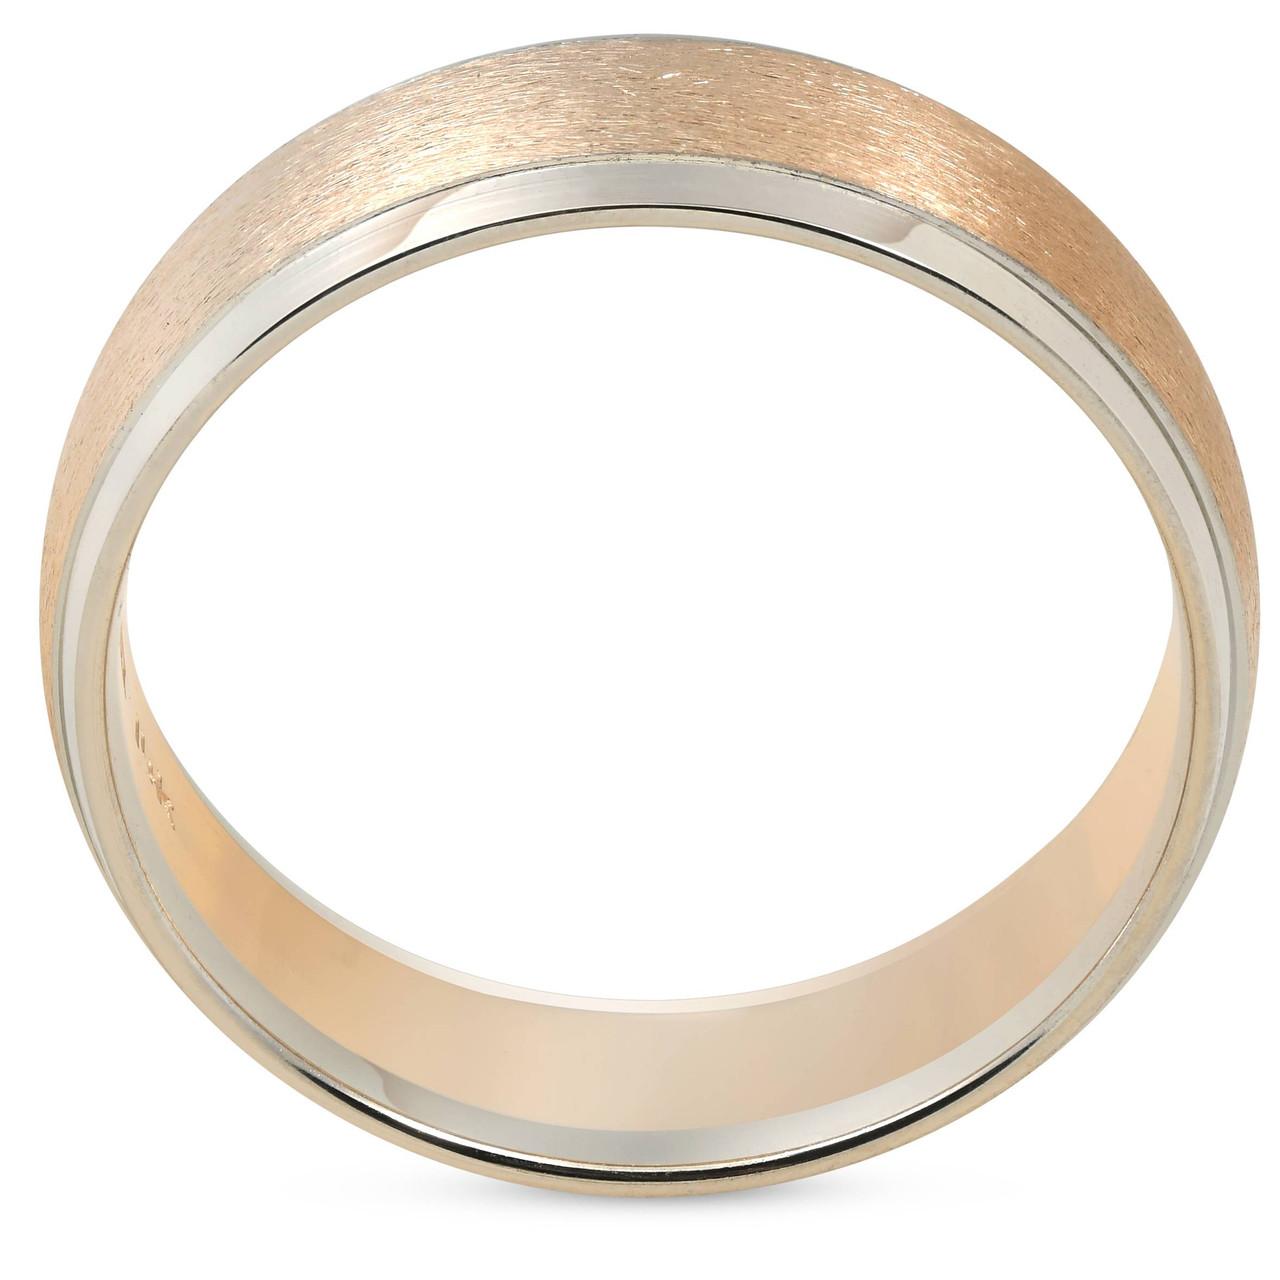 6f1425d58da Mens Plain Wedding Band 14K Gold Two Tone Comfort Fit. WB7735.  https   d3d71ba2asa5oz.cloudfront.net 53000589 images wb7735%